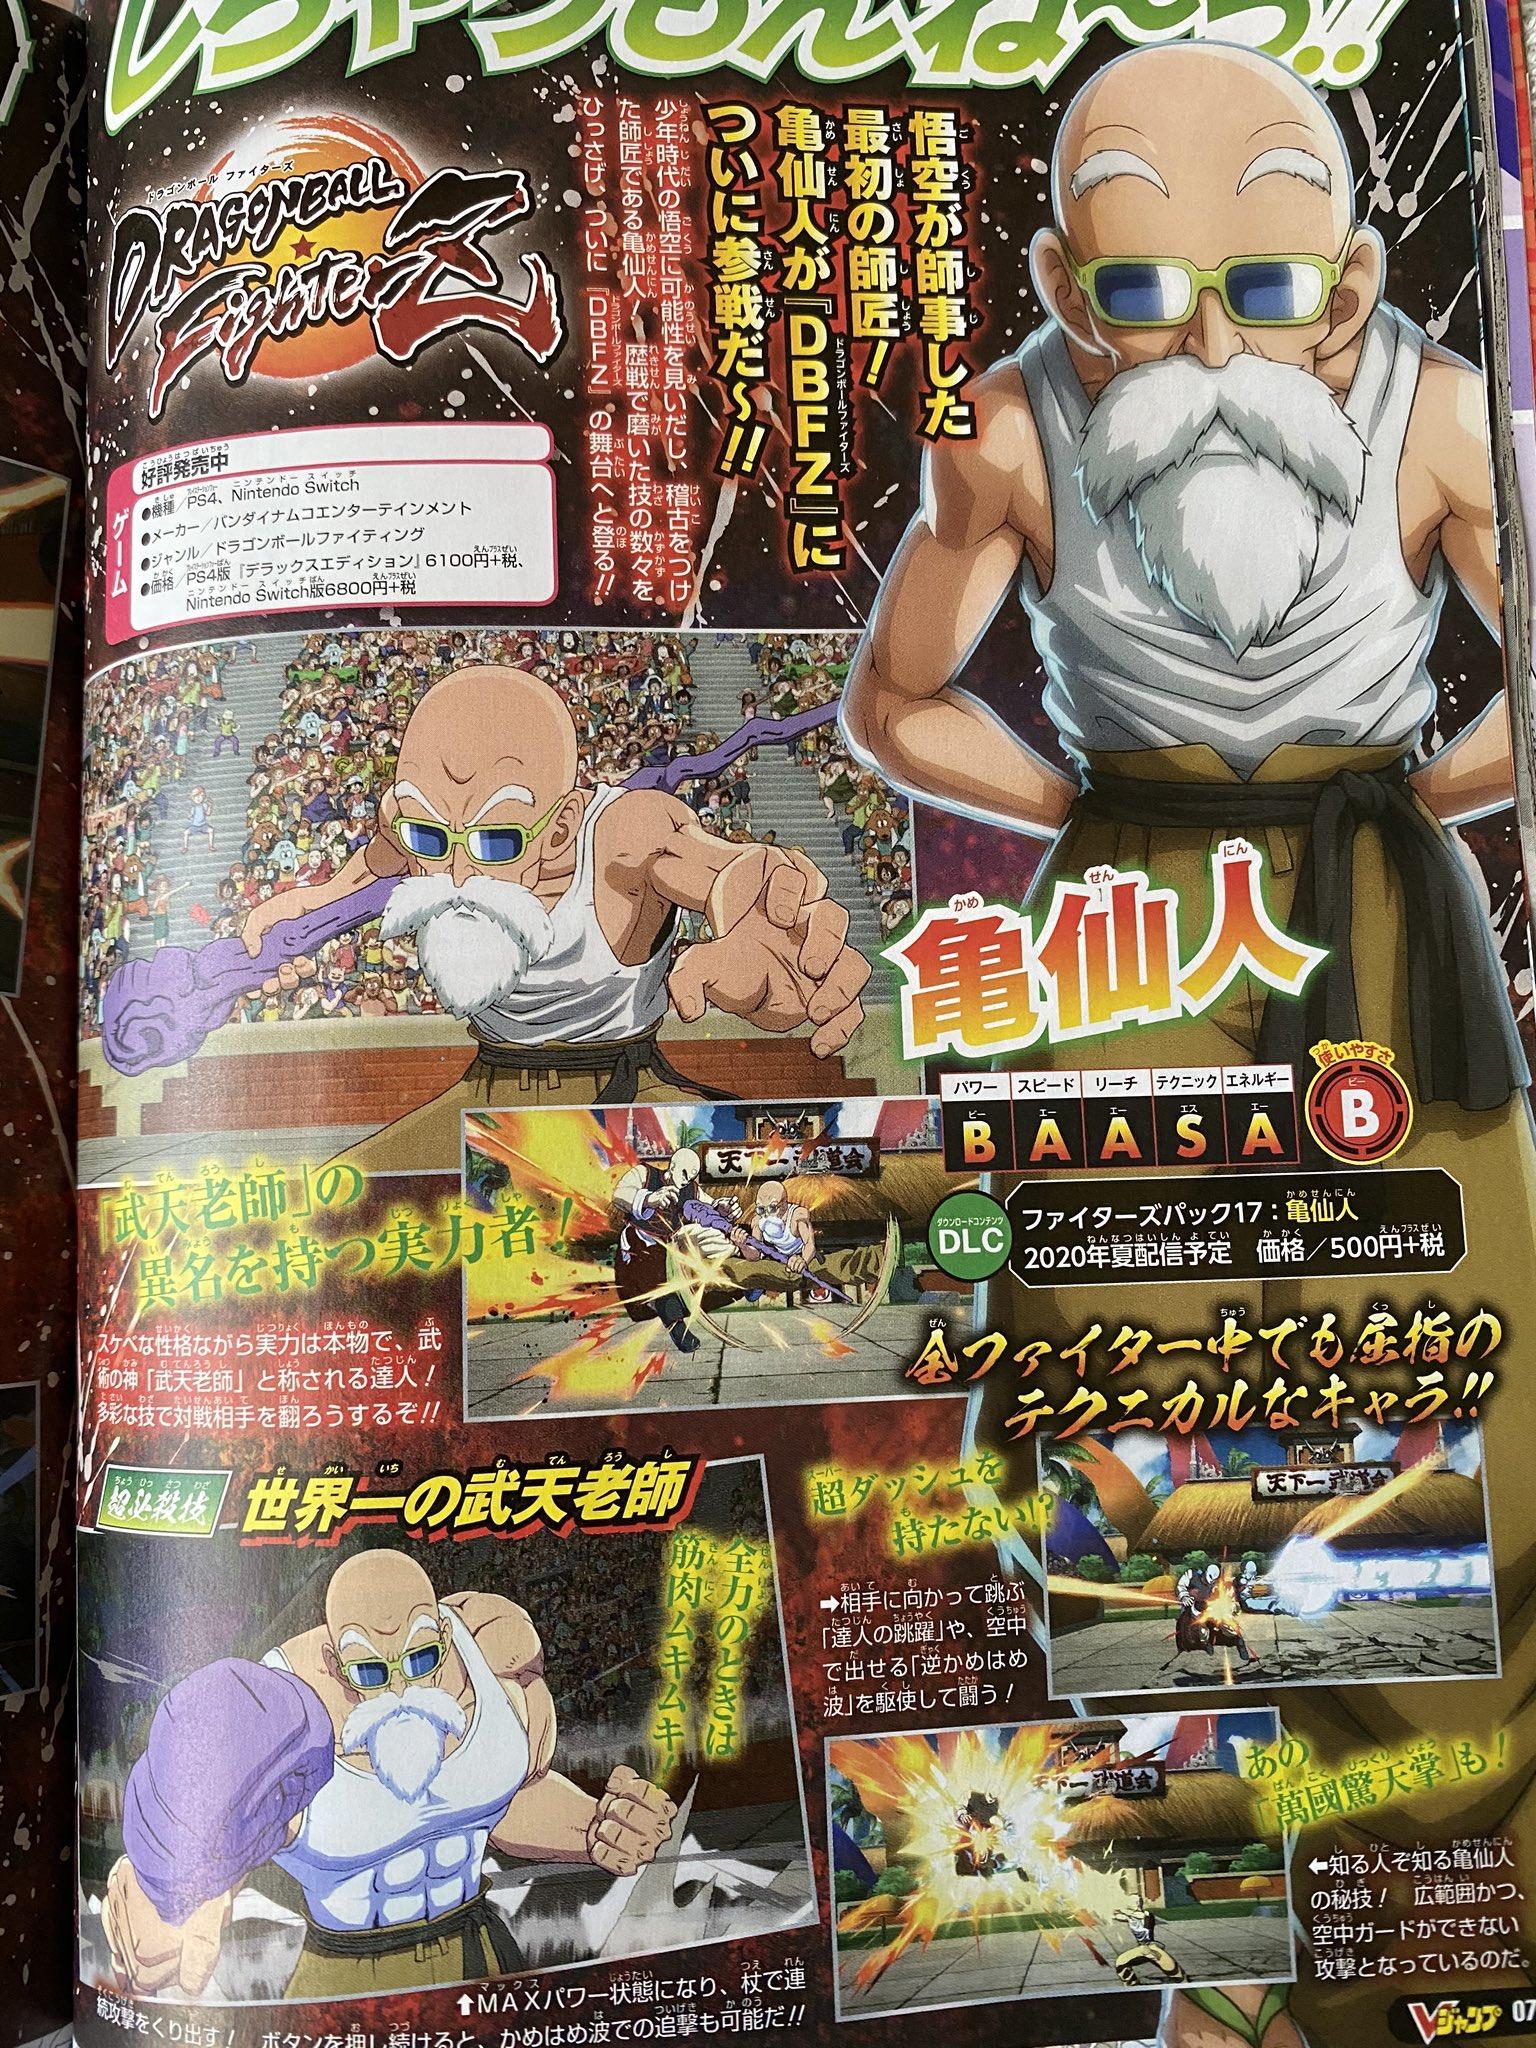 Dragon Ball Fighterz Master Roshi DLC moves